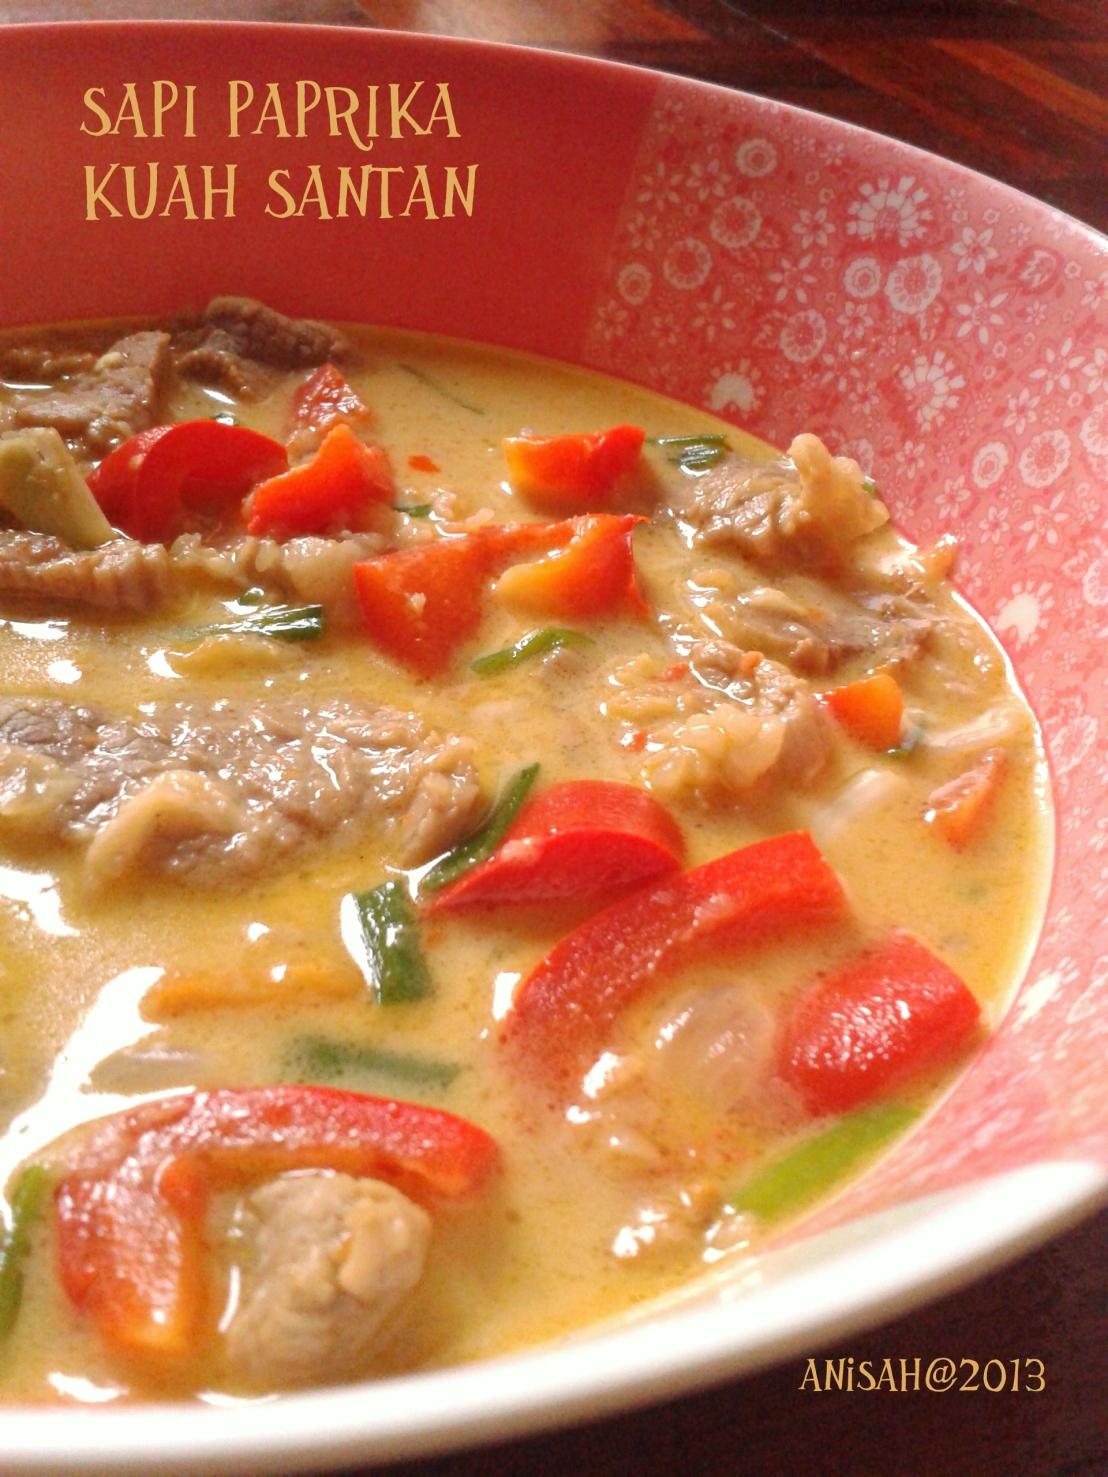 Resep Sapi Paprika KuahSantan